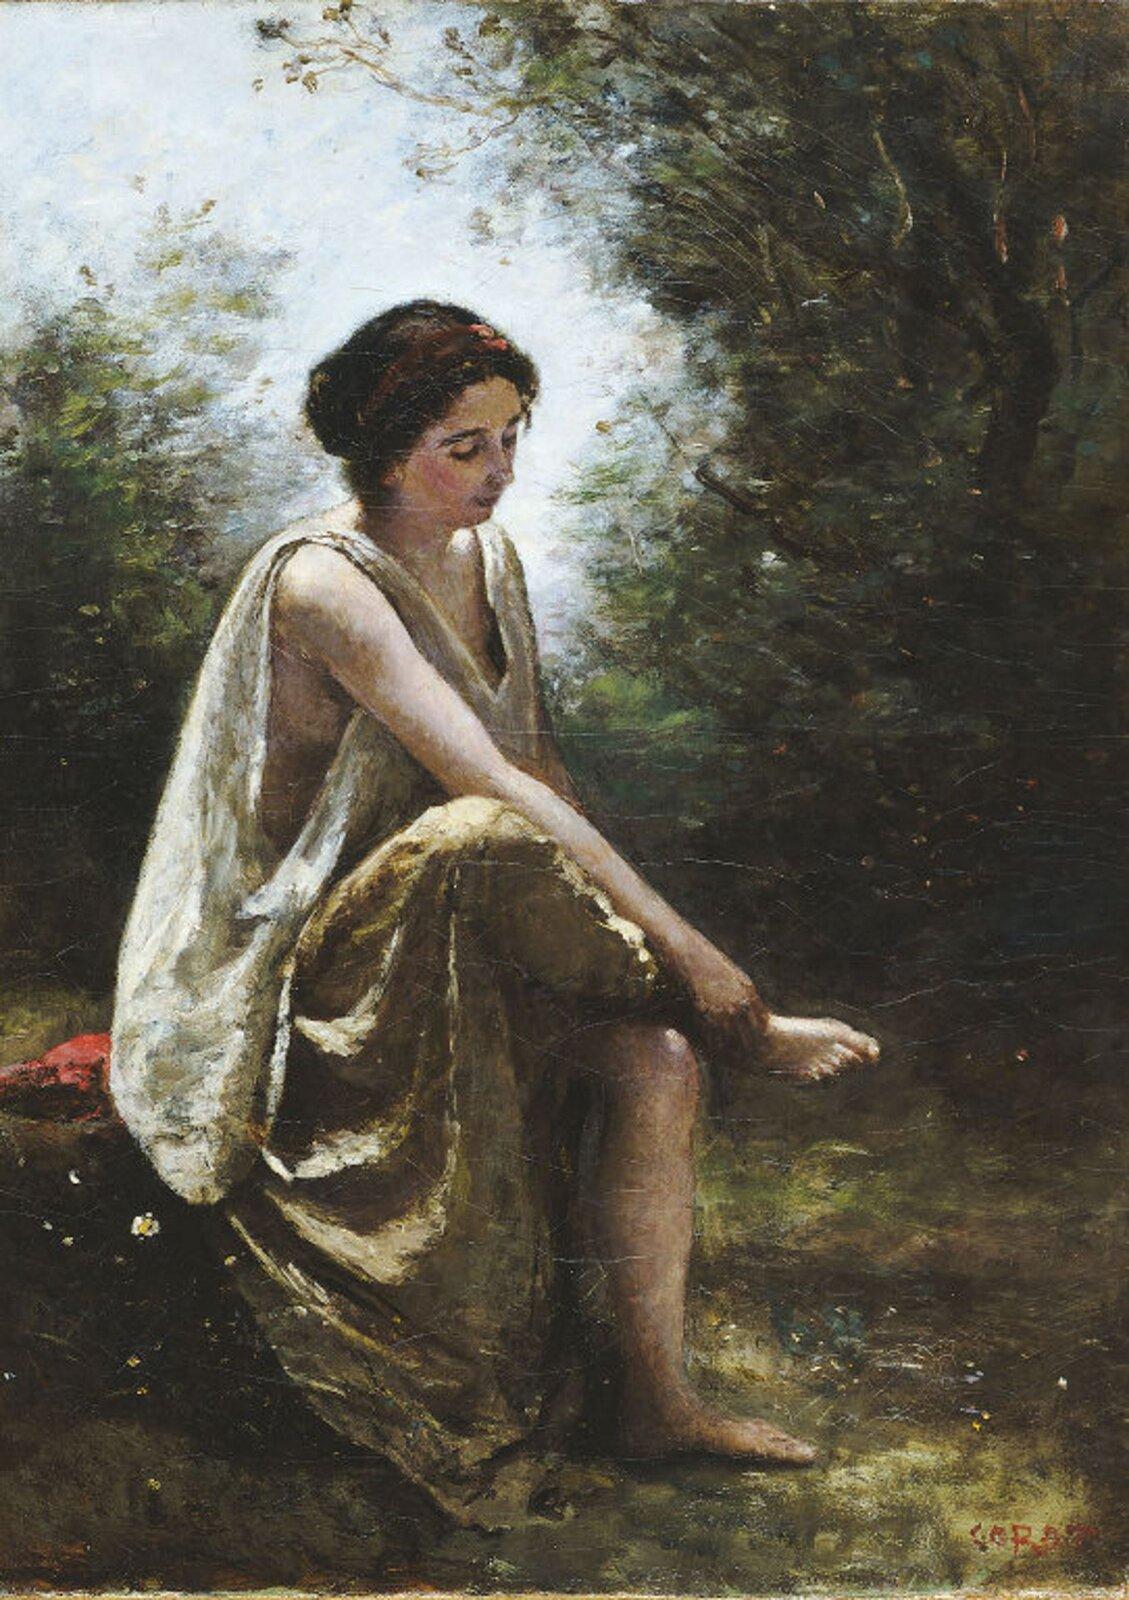 Kultura i mity – Orfeusz i Eurydyka - Epodreczniki.pl